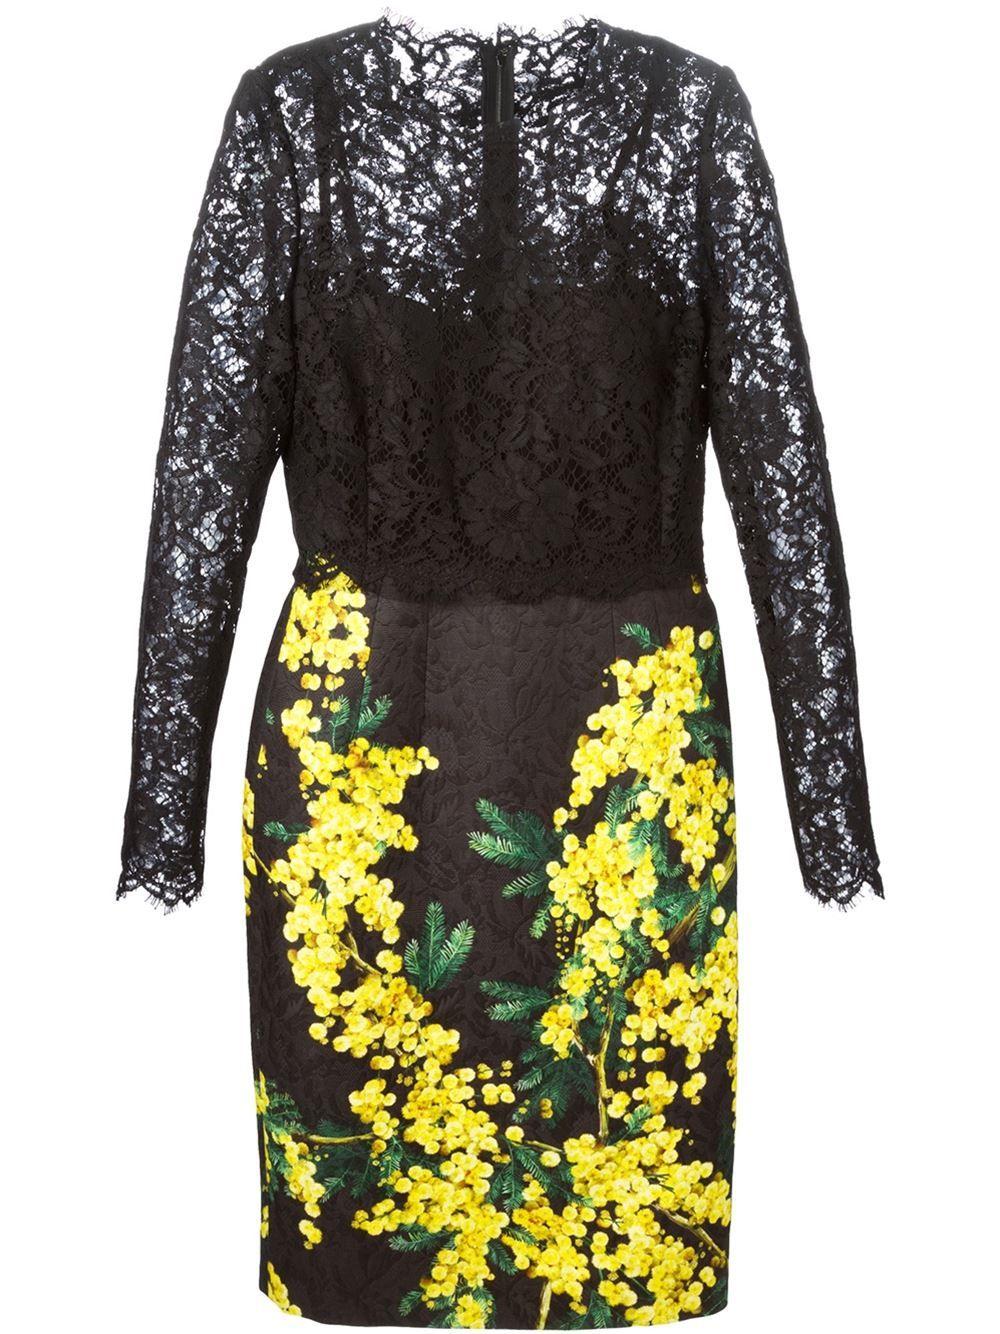 f0afd53b9e6 Dolce   Gabbana Mimosa Print Dress - Profile - Farfetch.com jαɢlαdy ...